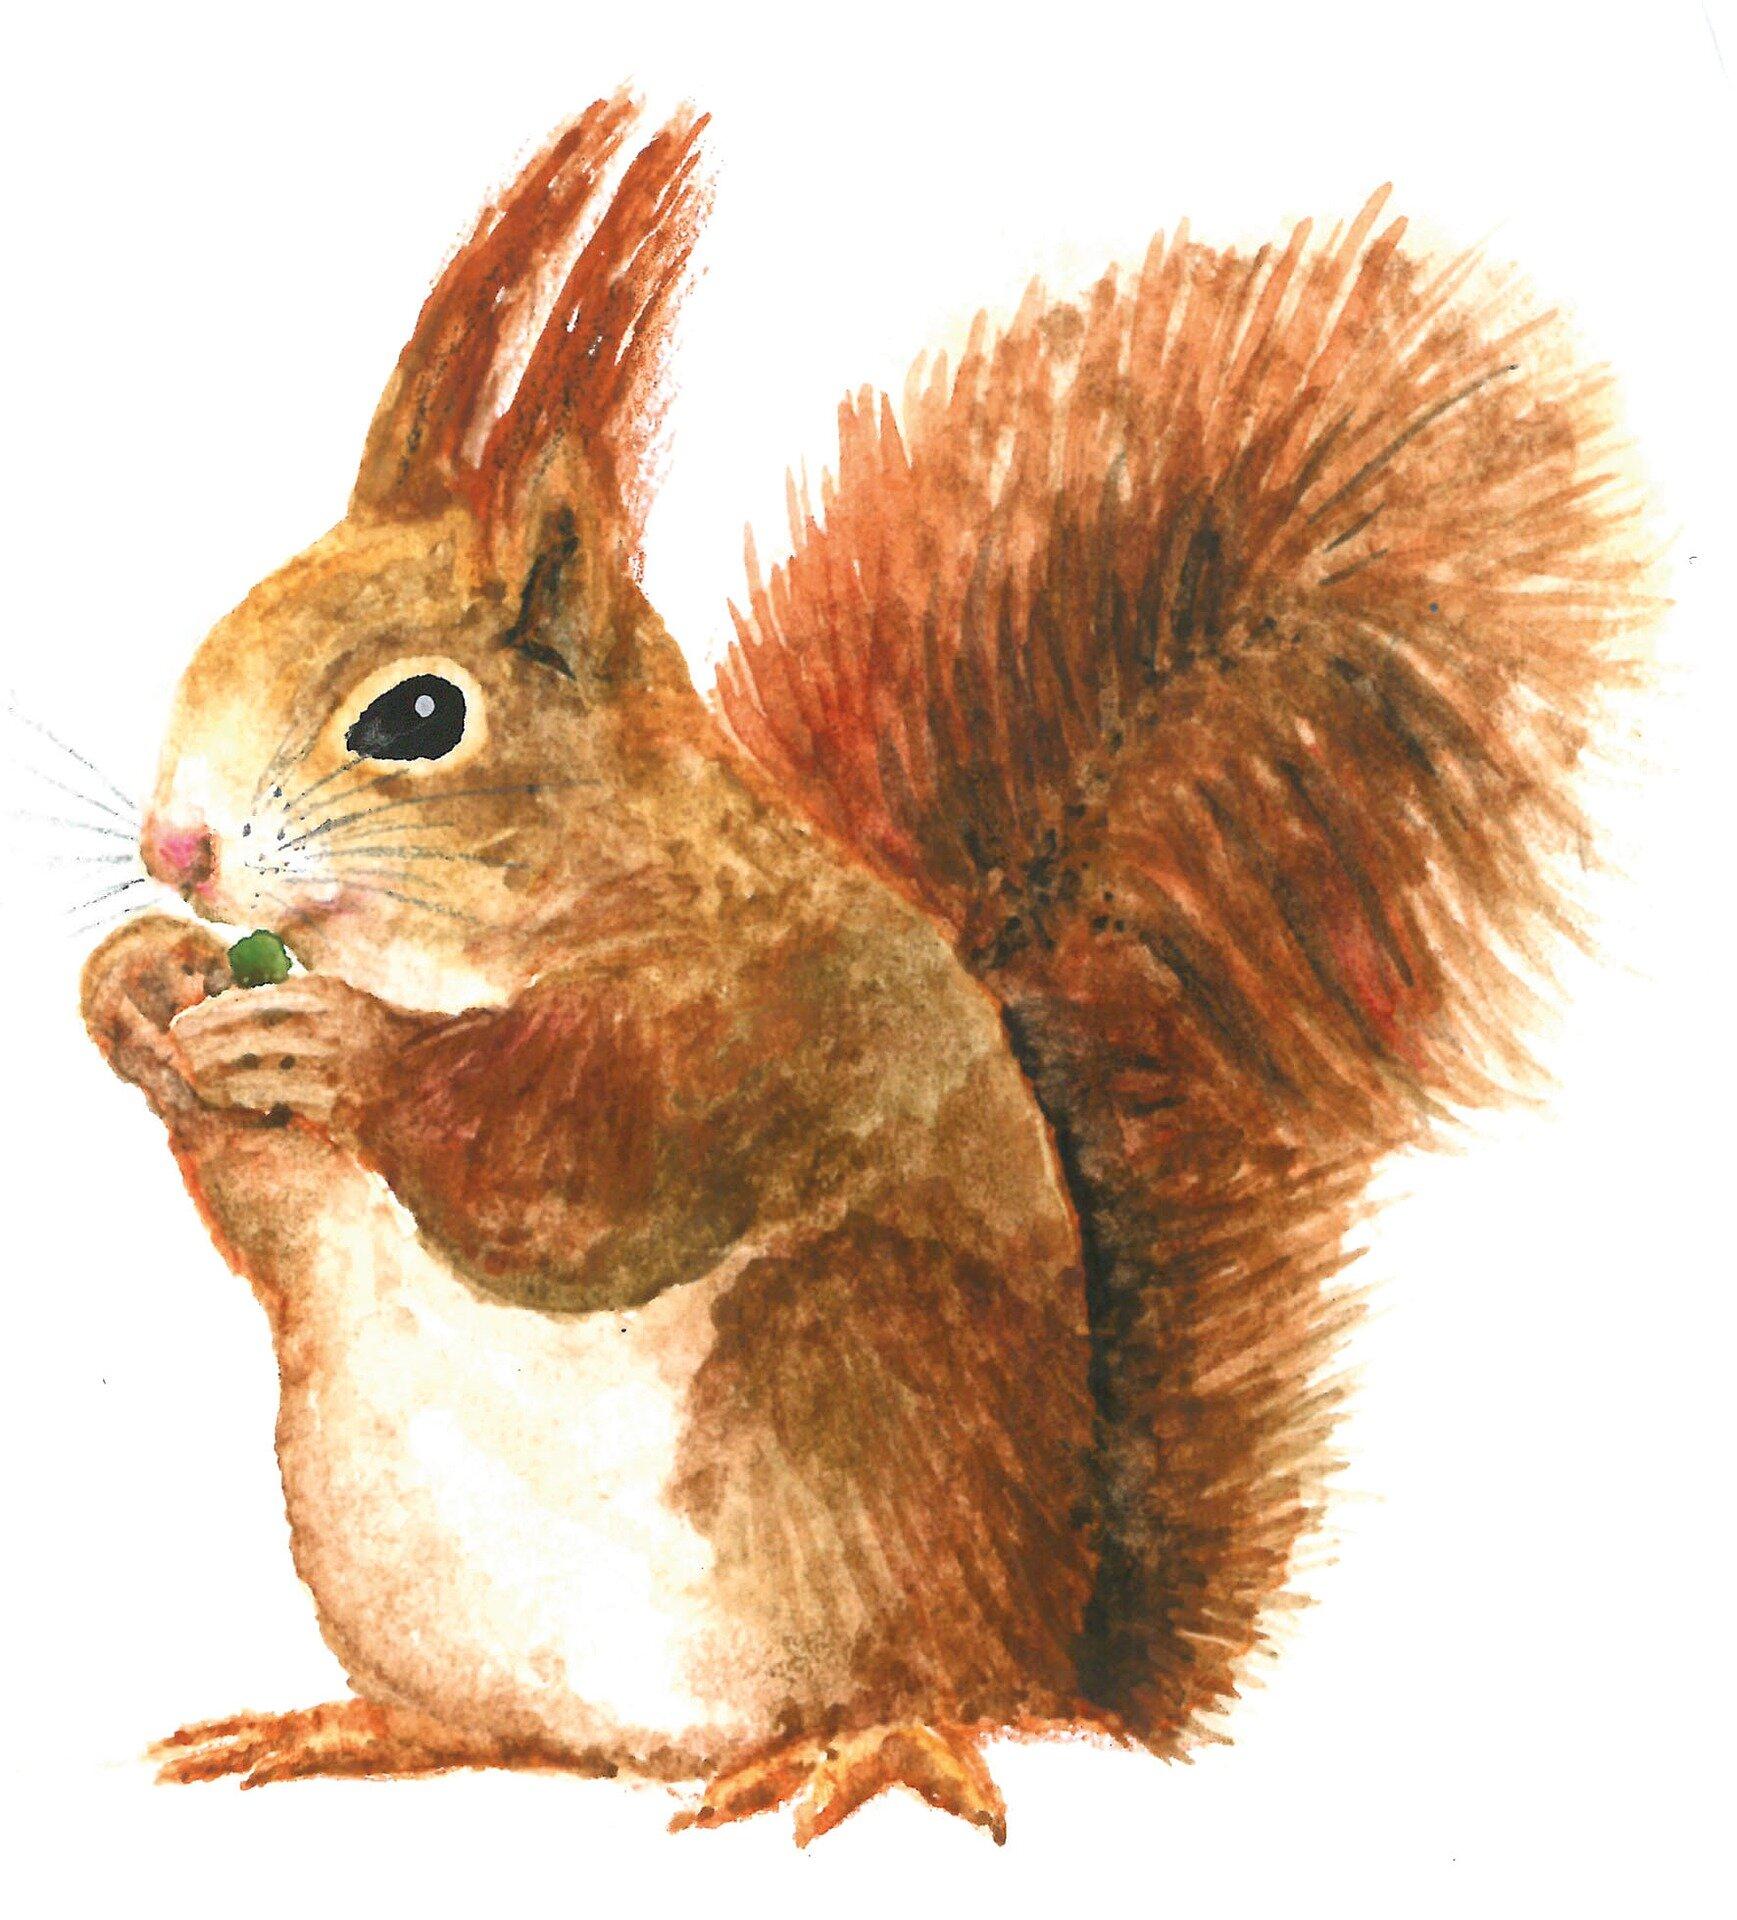 squirrel-3052846_1920.jpg